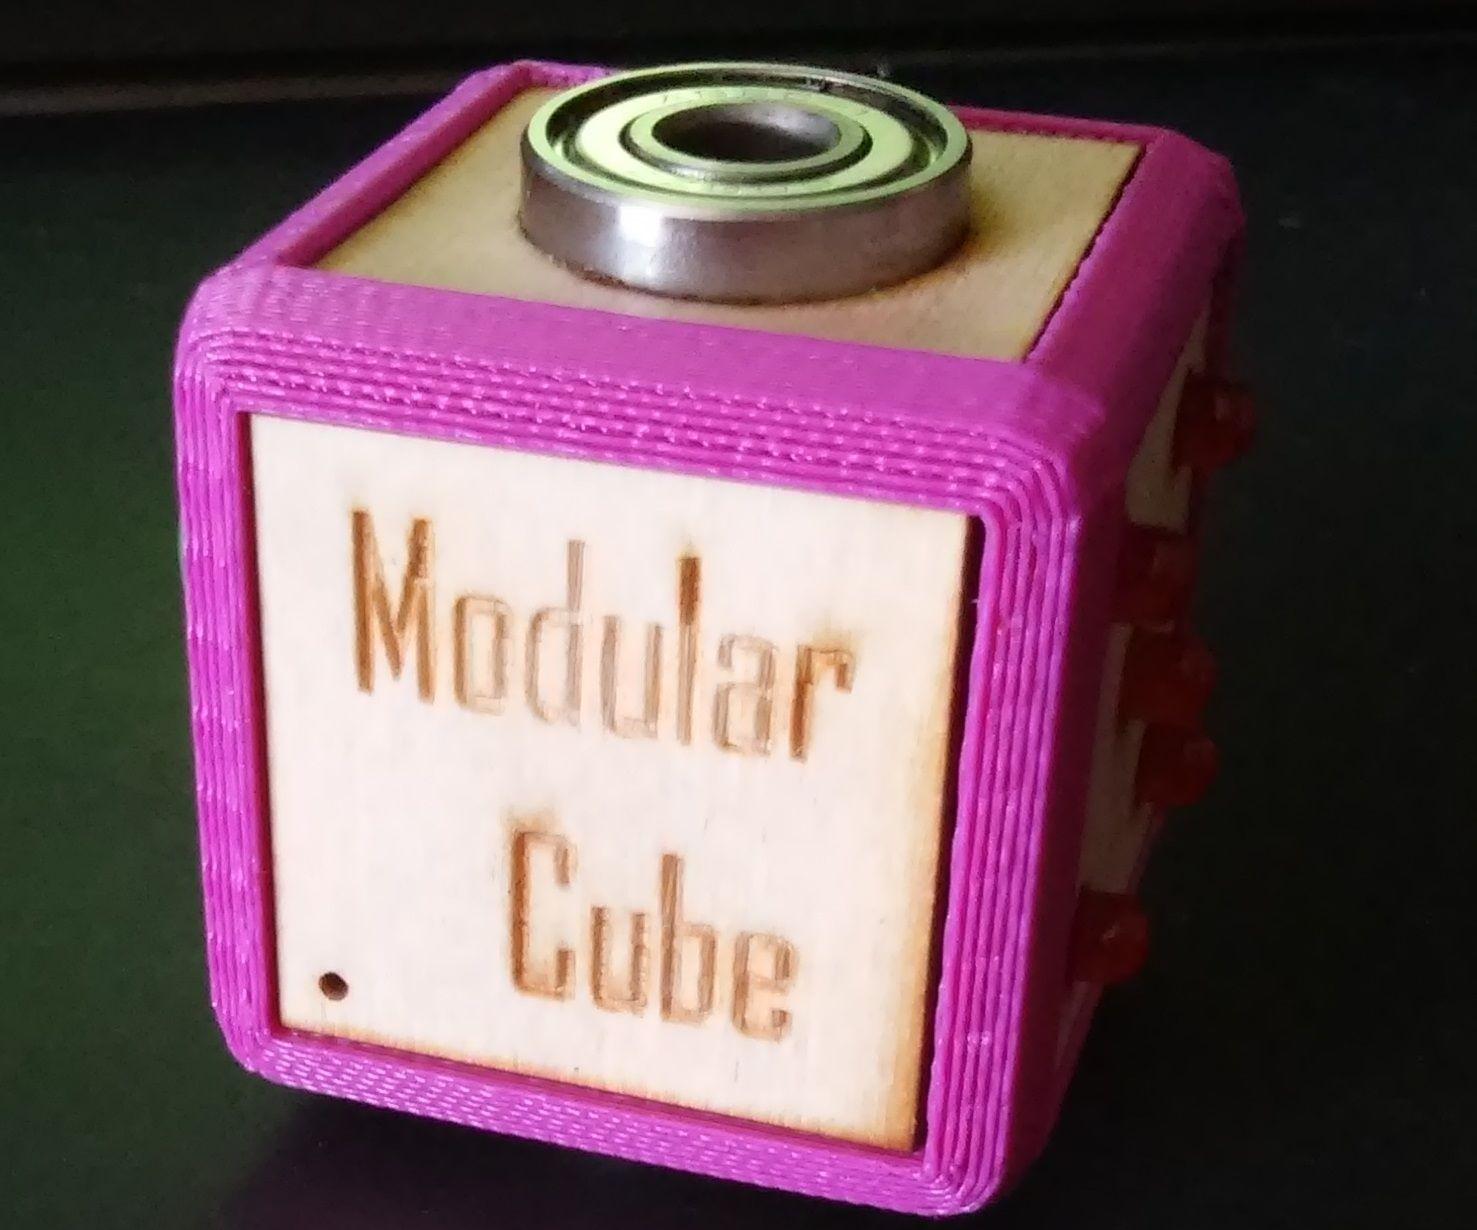 Modular Figet Cube